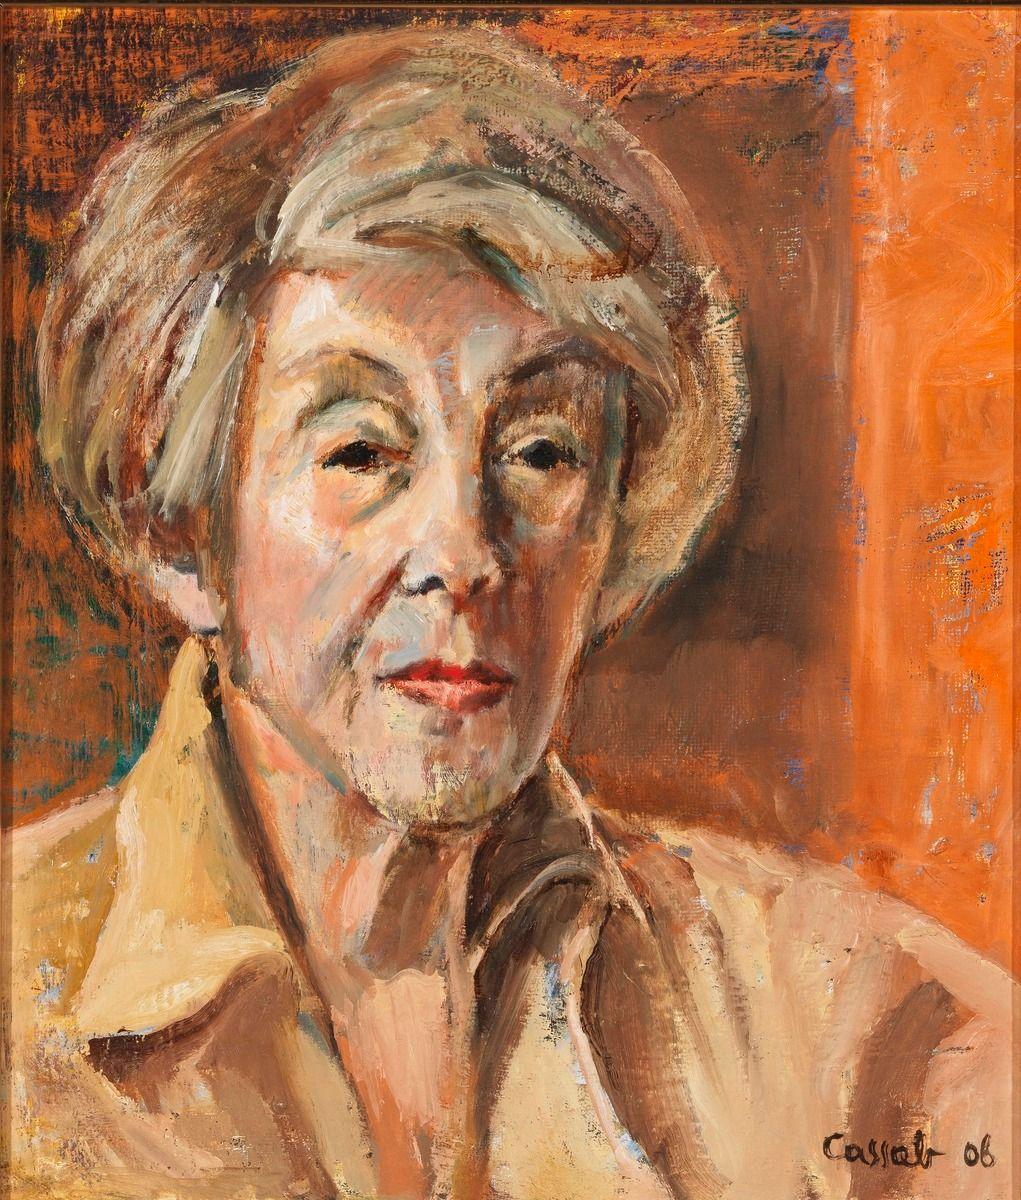 Selfportrait, 2006, by Judy Cassab (Australian, 19202015